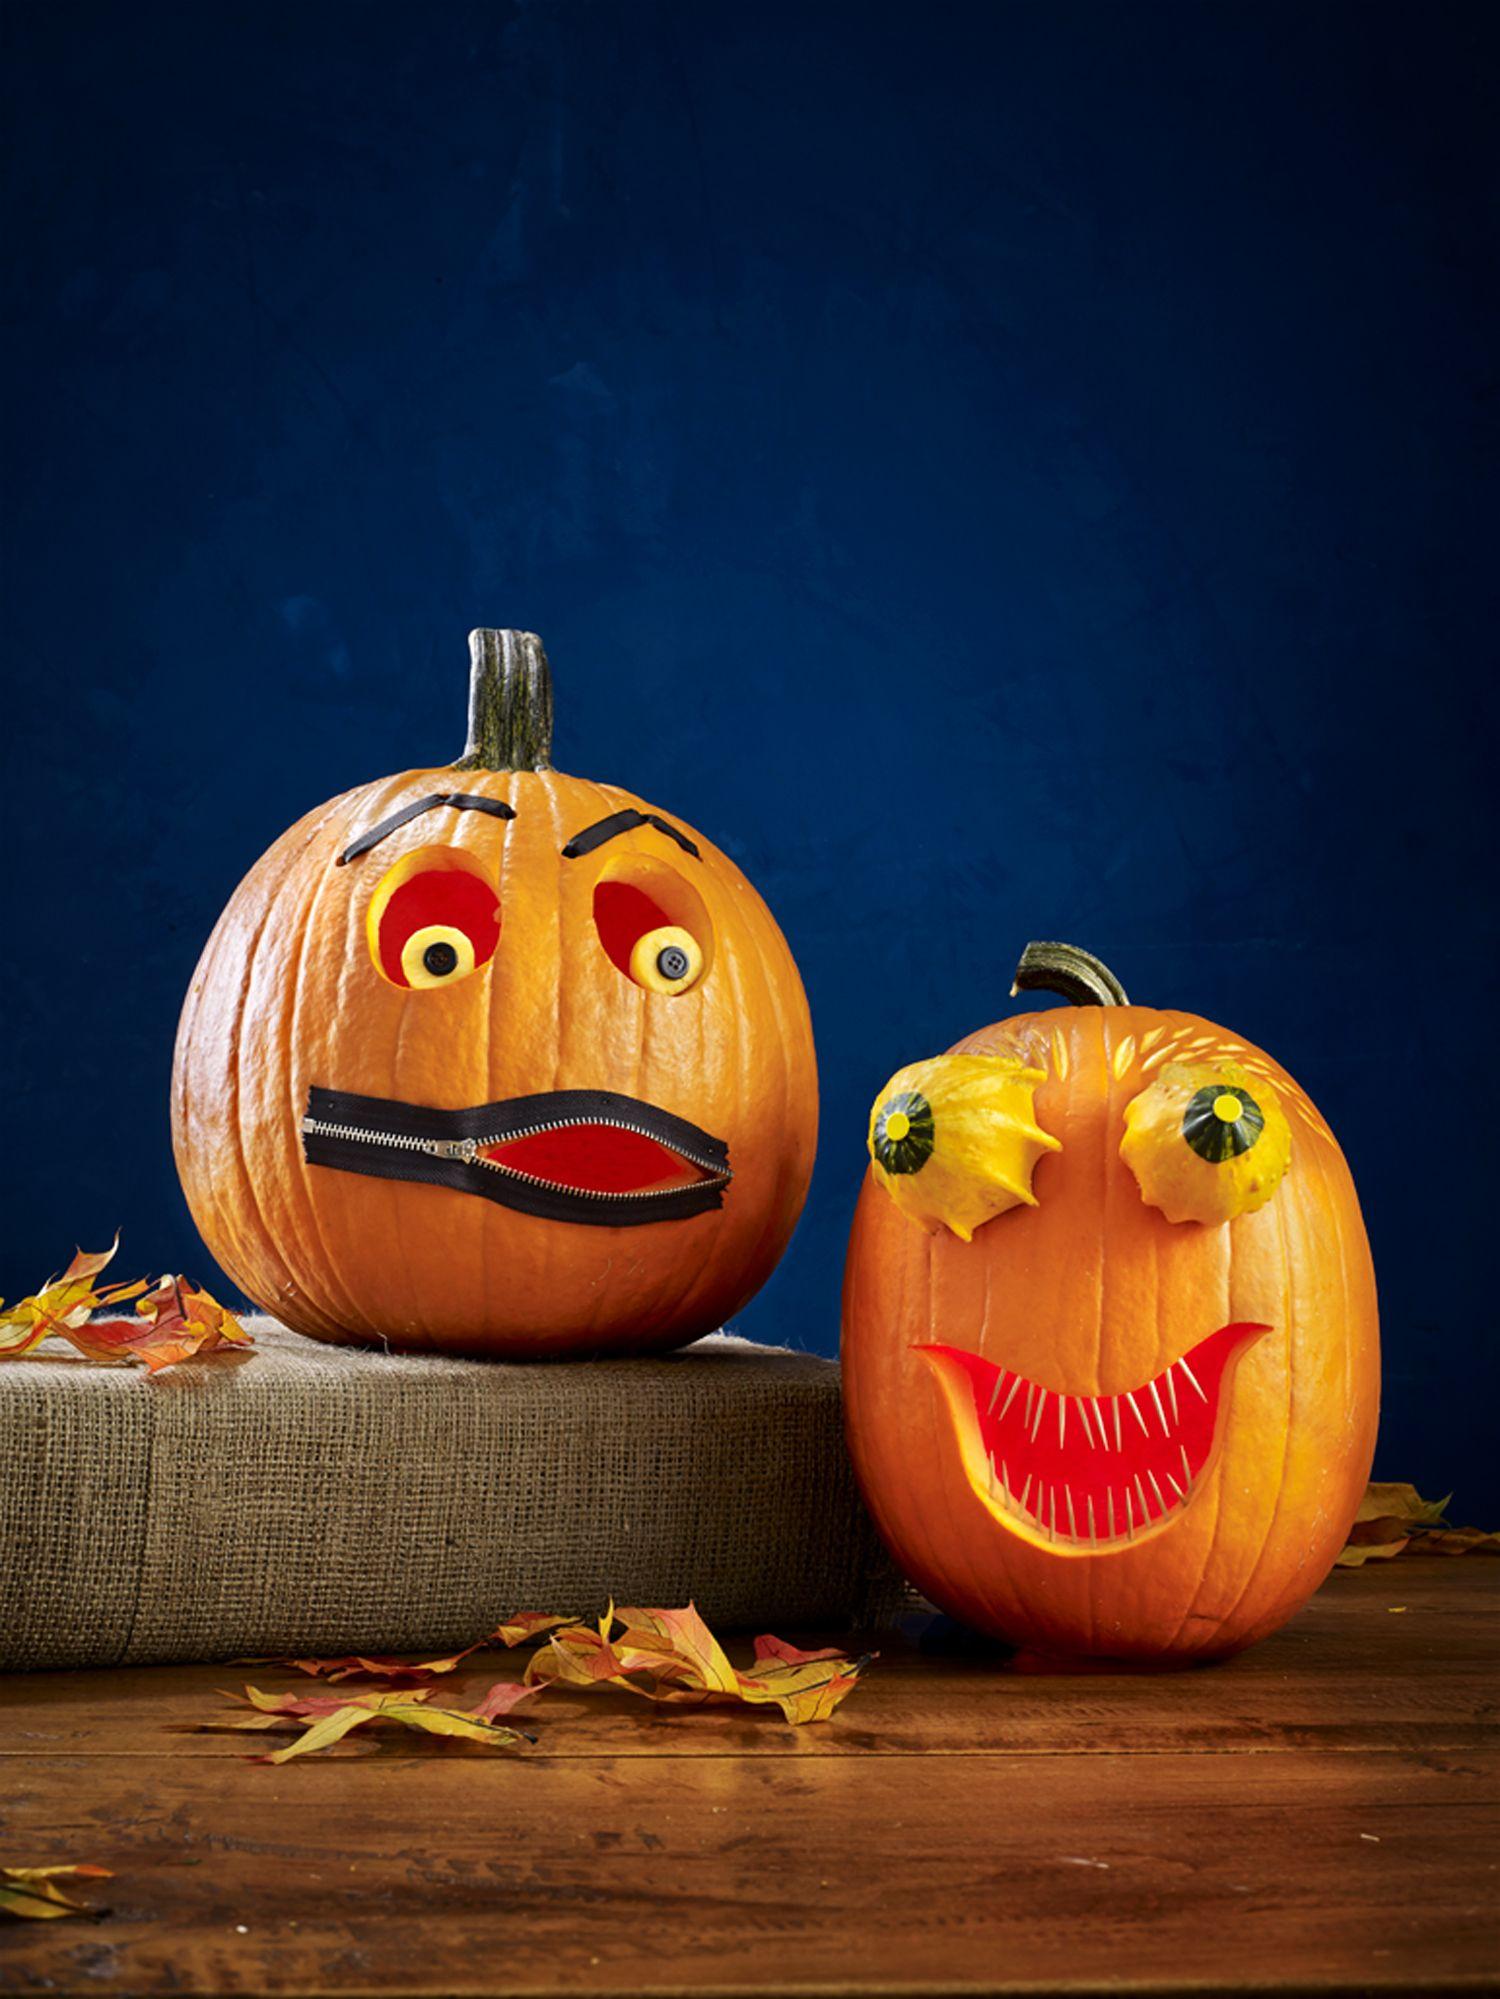 52 best pumpkin carving ideas halloween 2018 creative jack o 52 best pumpkin carving ideas halloween 2018 creative jack o lantern designs solutioingenieria Images